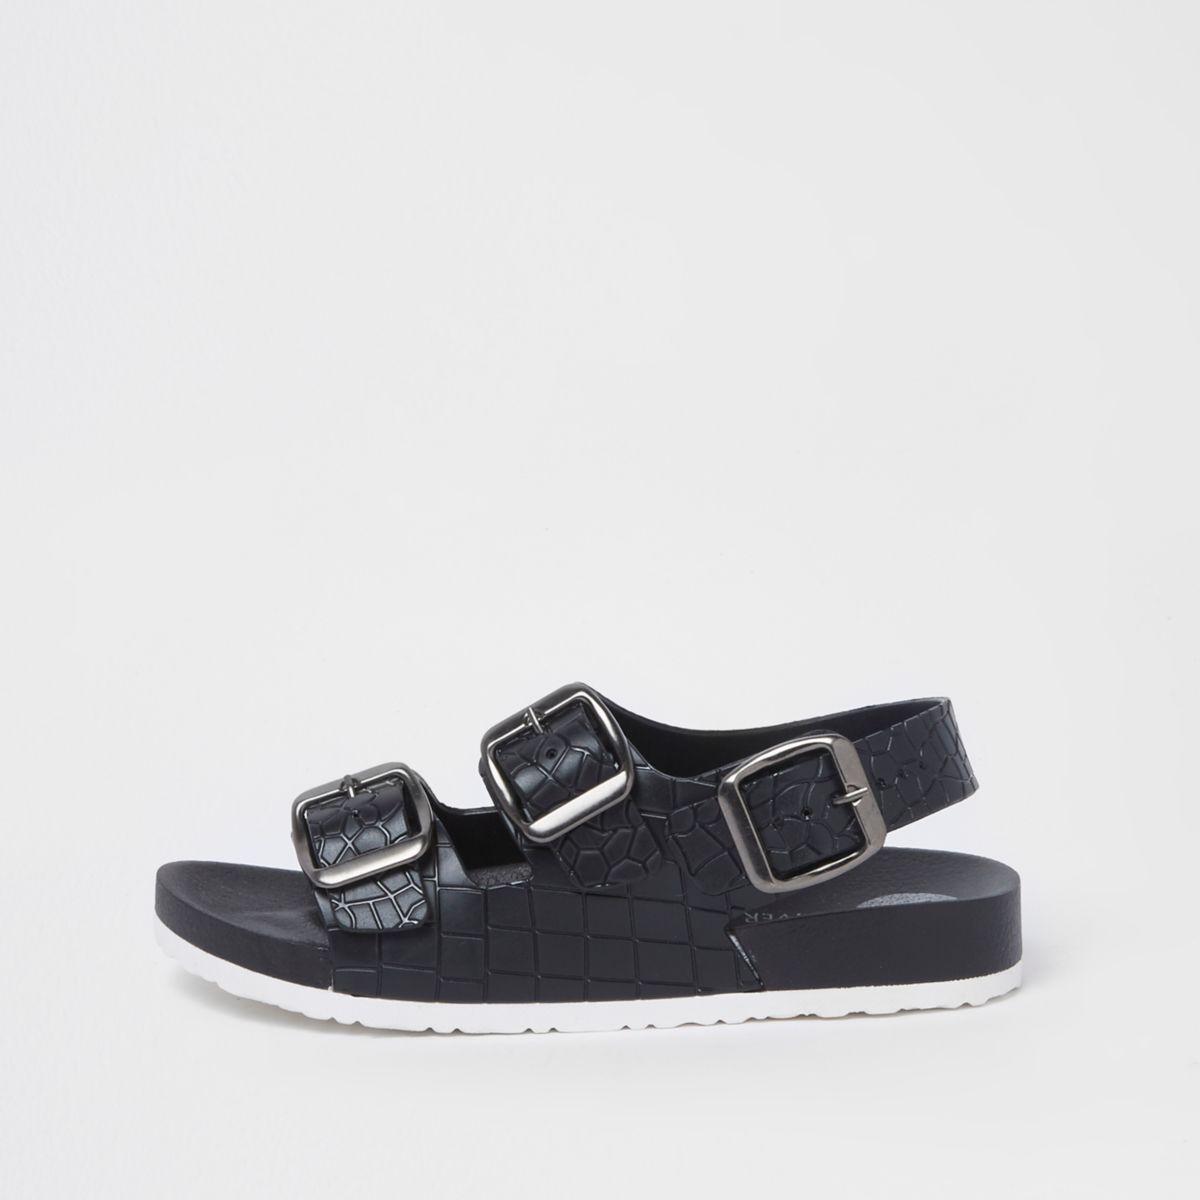 Boys black croc buckle sandals